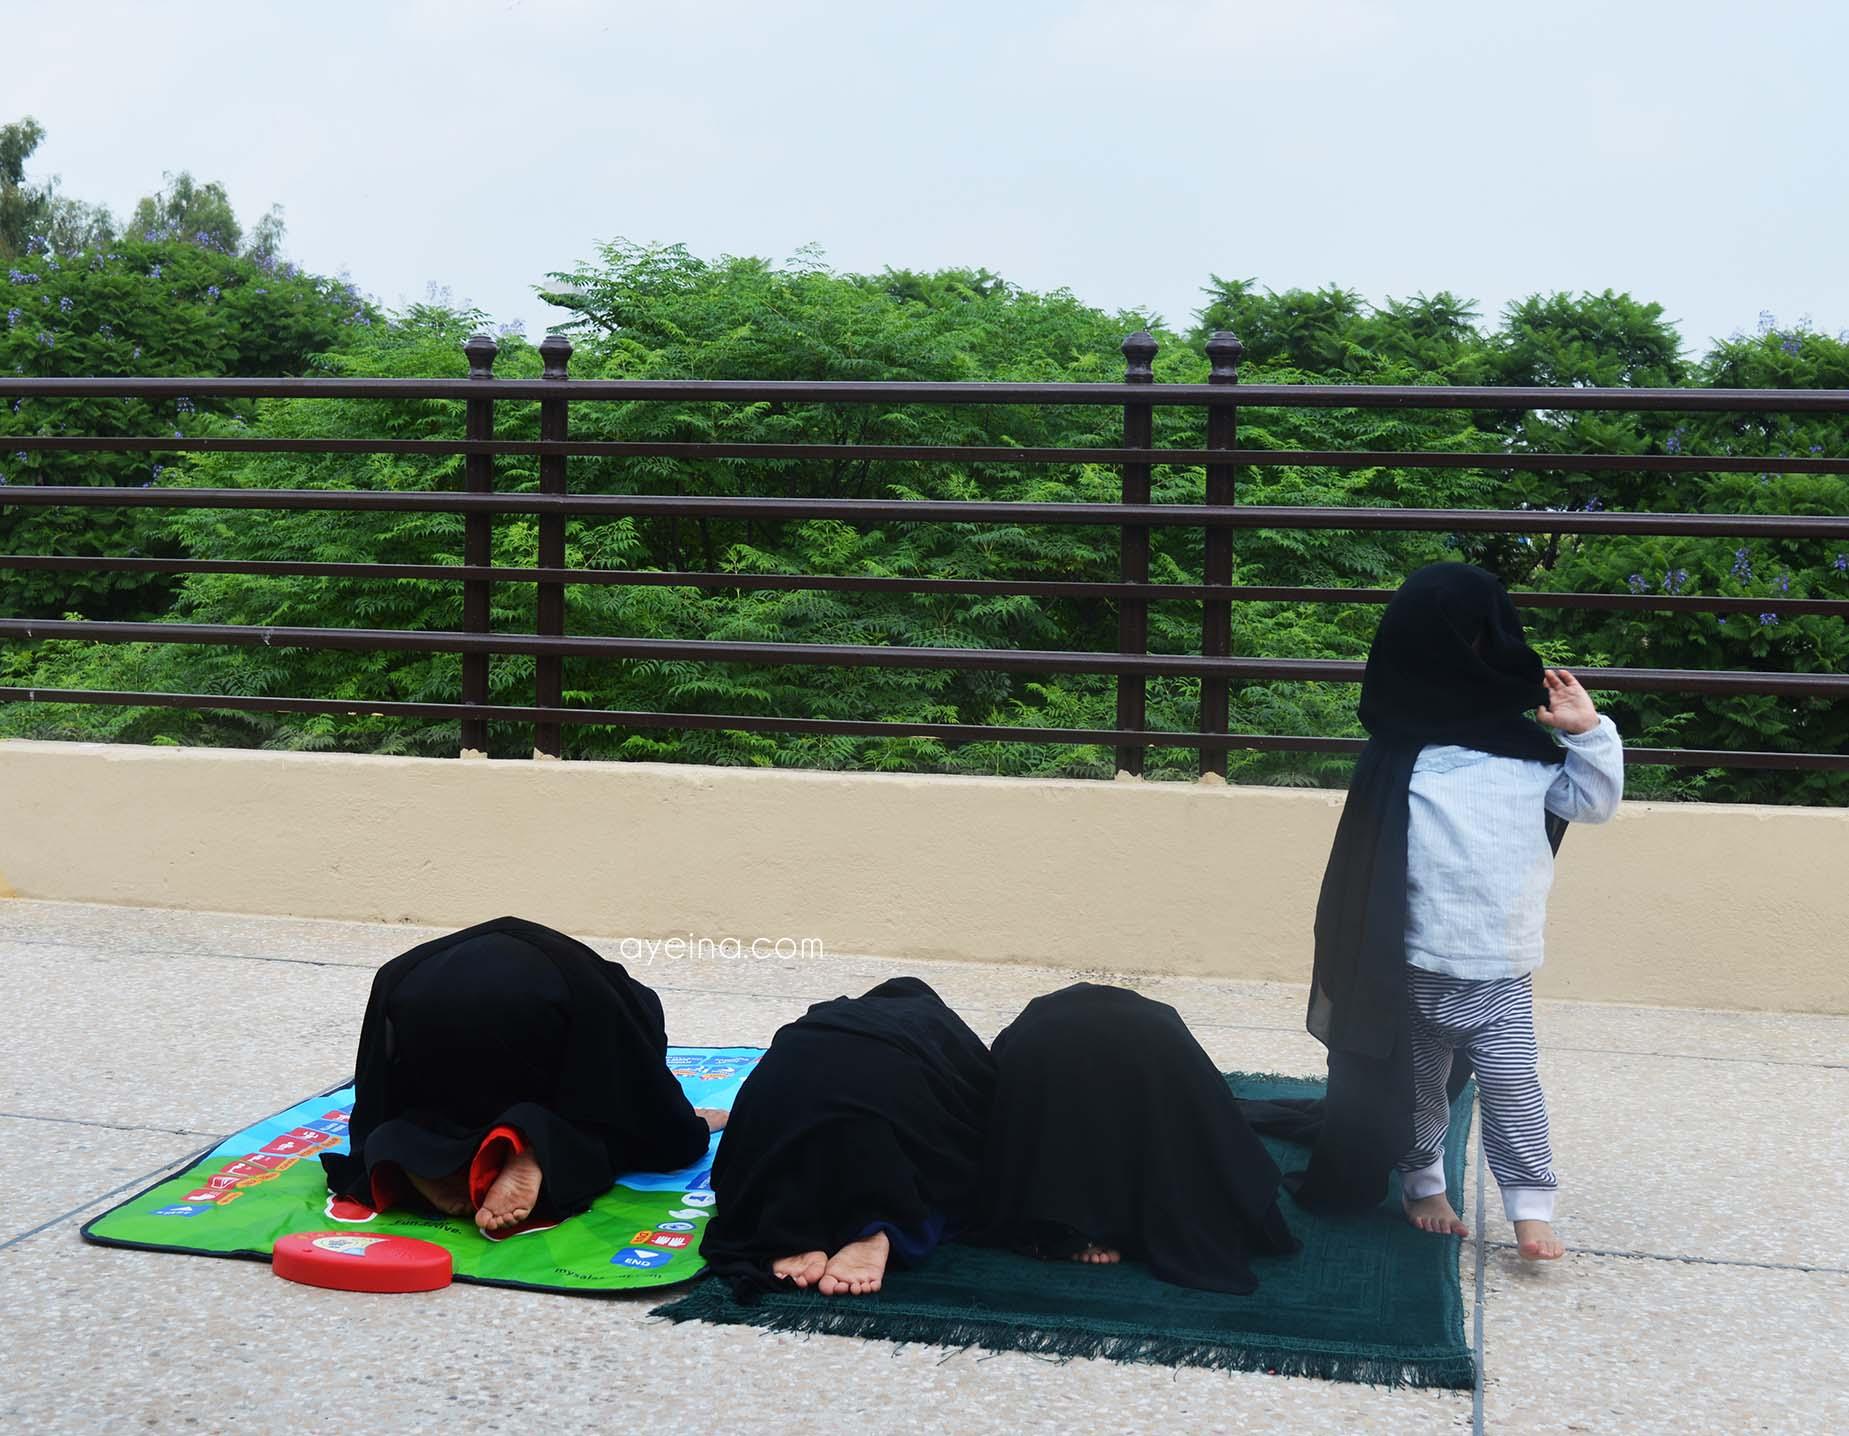 my salah mat kids on rooftop greenery trees pray together stay muslimah hijab